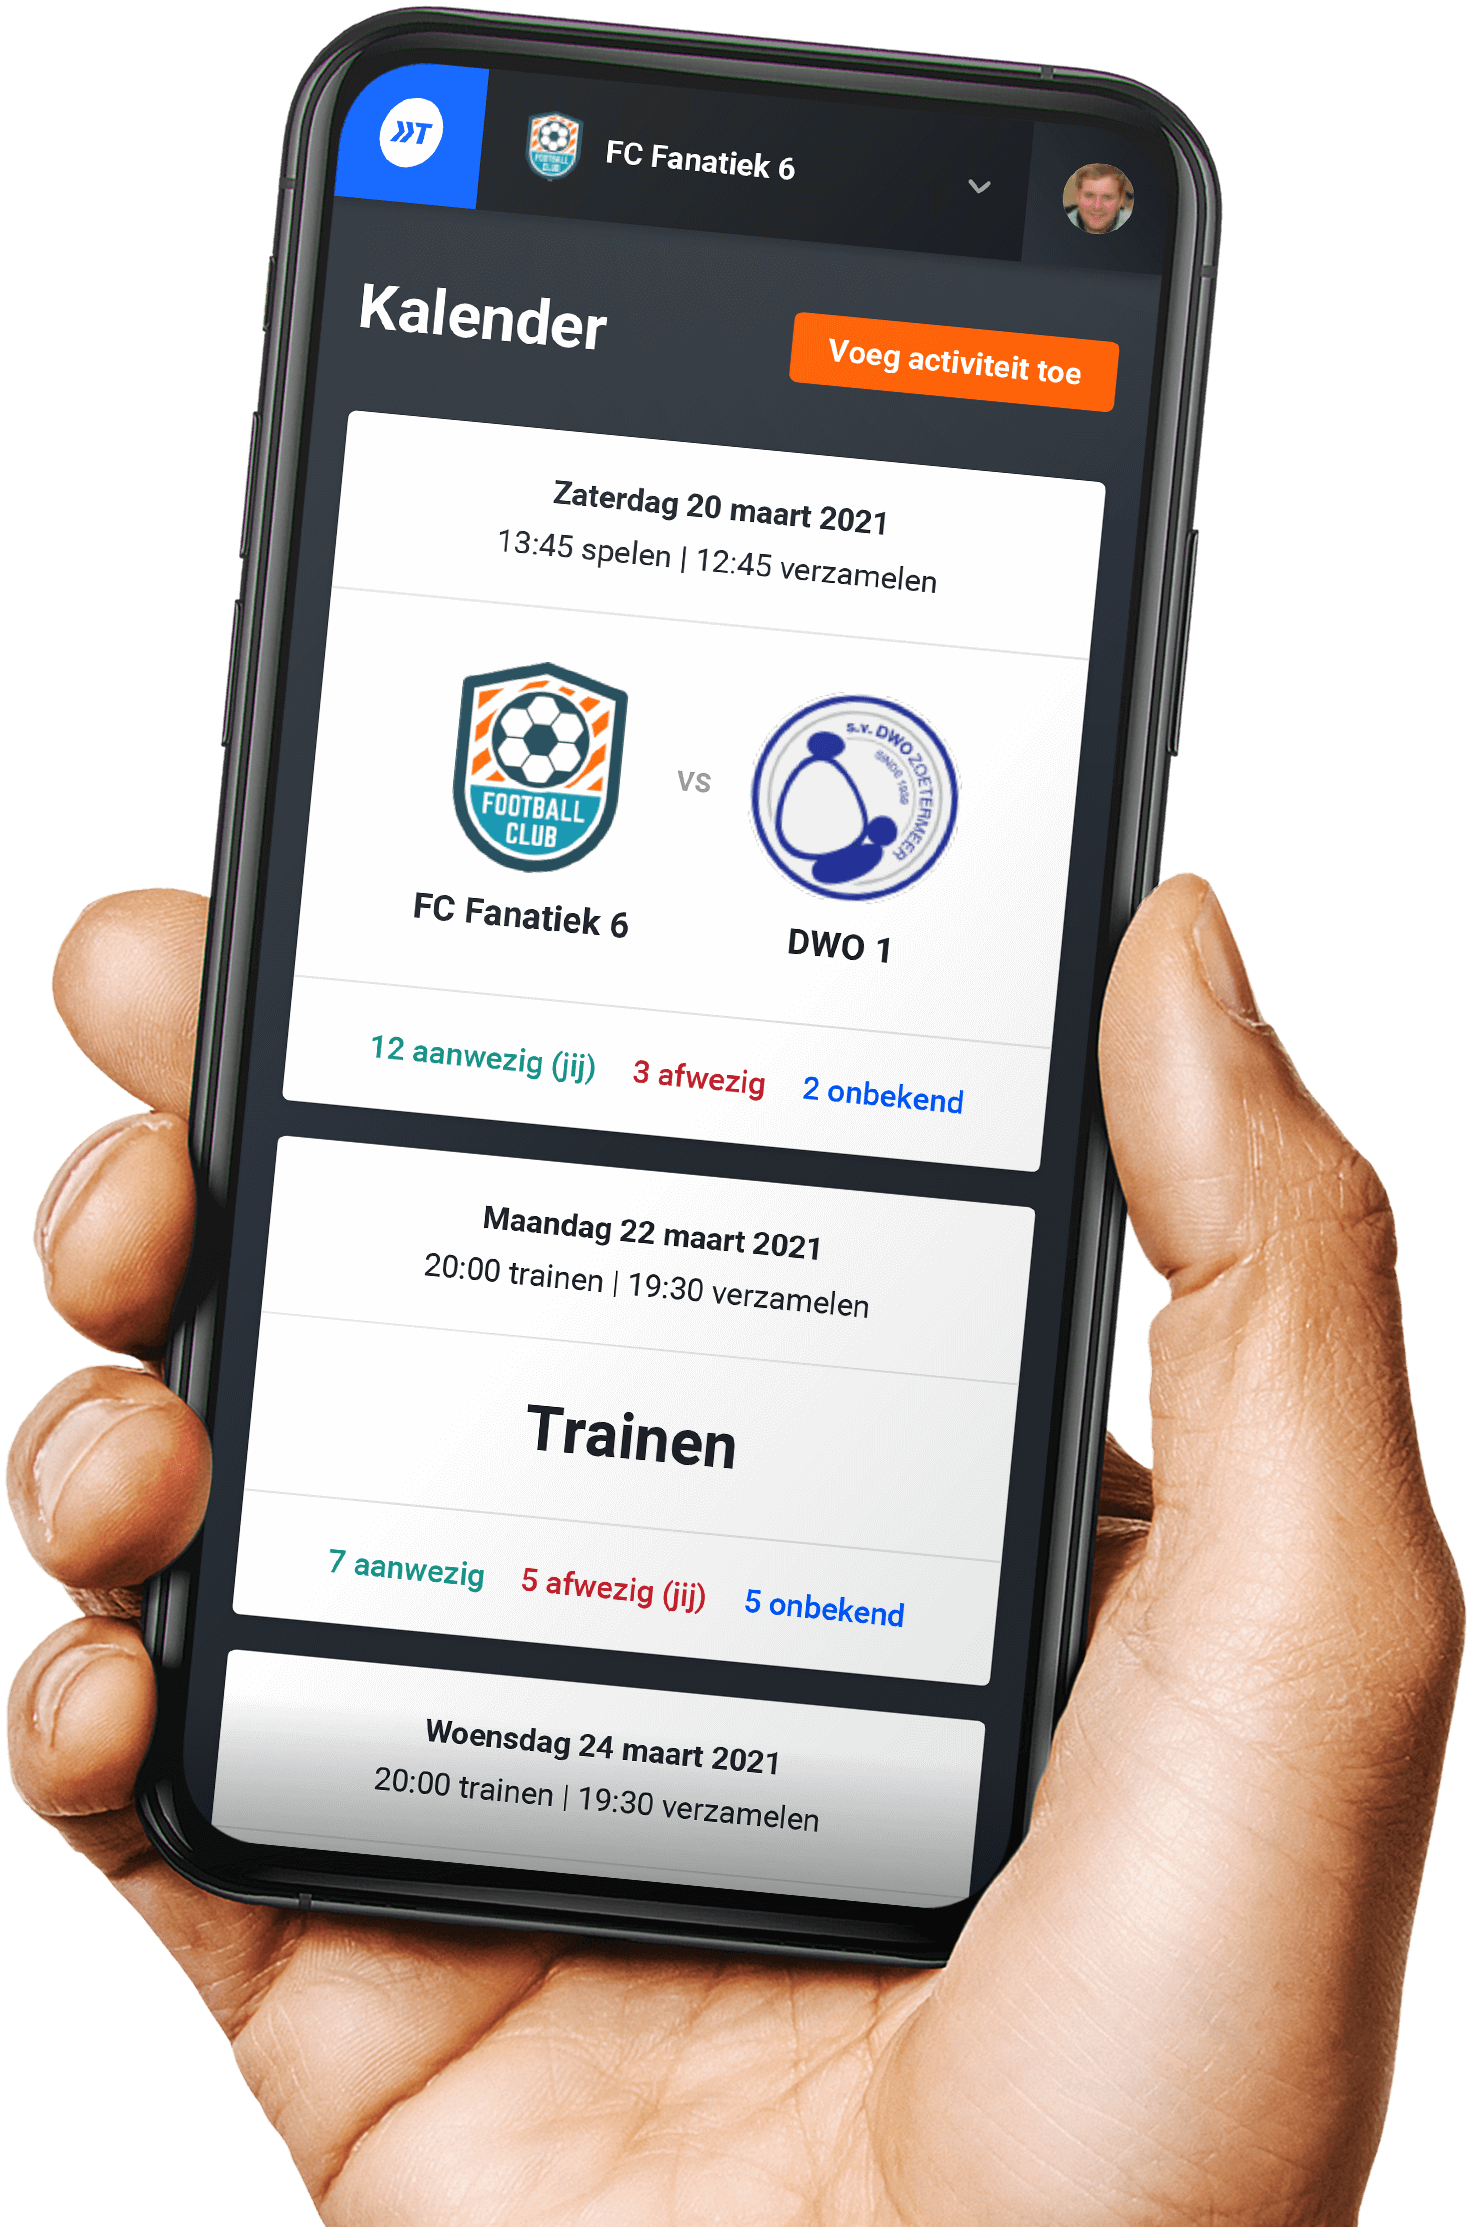 About Next Match web app